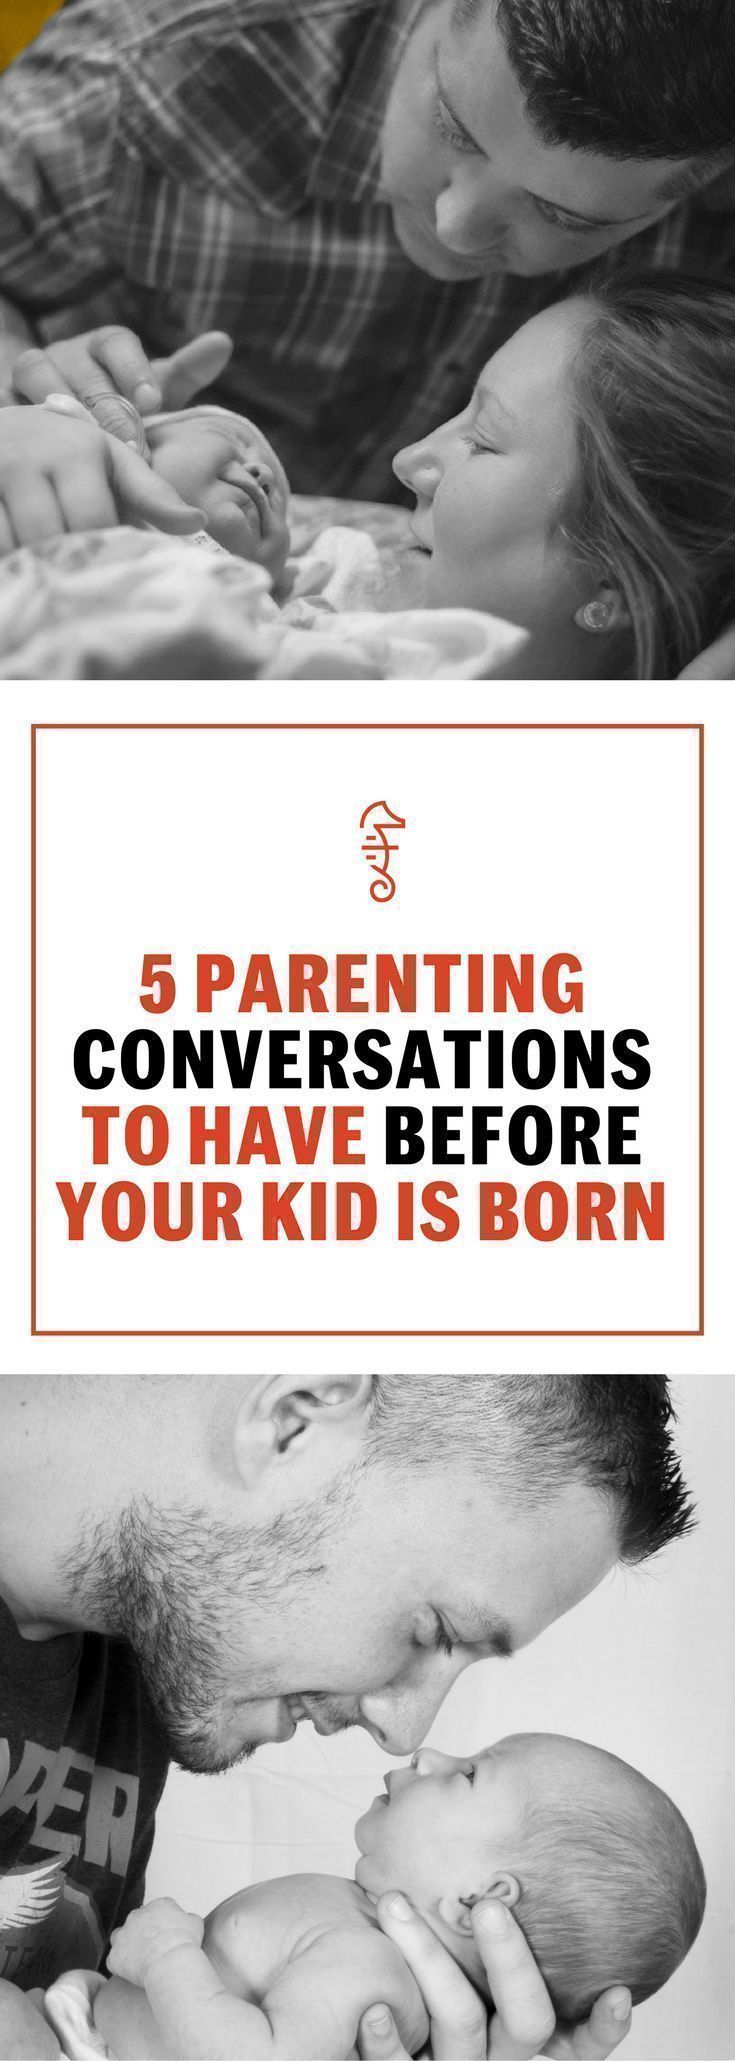 new parents quotes, new parents advice, new parents survival kit, relationship advice, marriage advice #parentingadvicequotes #newparentquotes #marriageadvicequotes